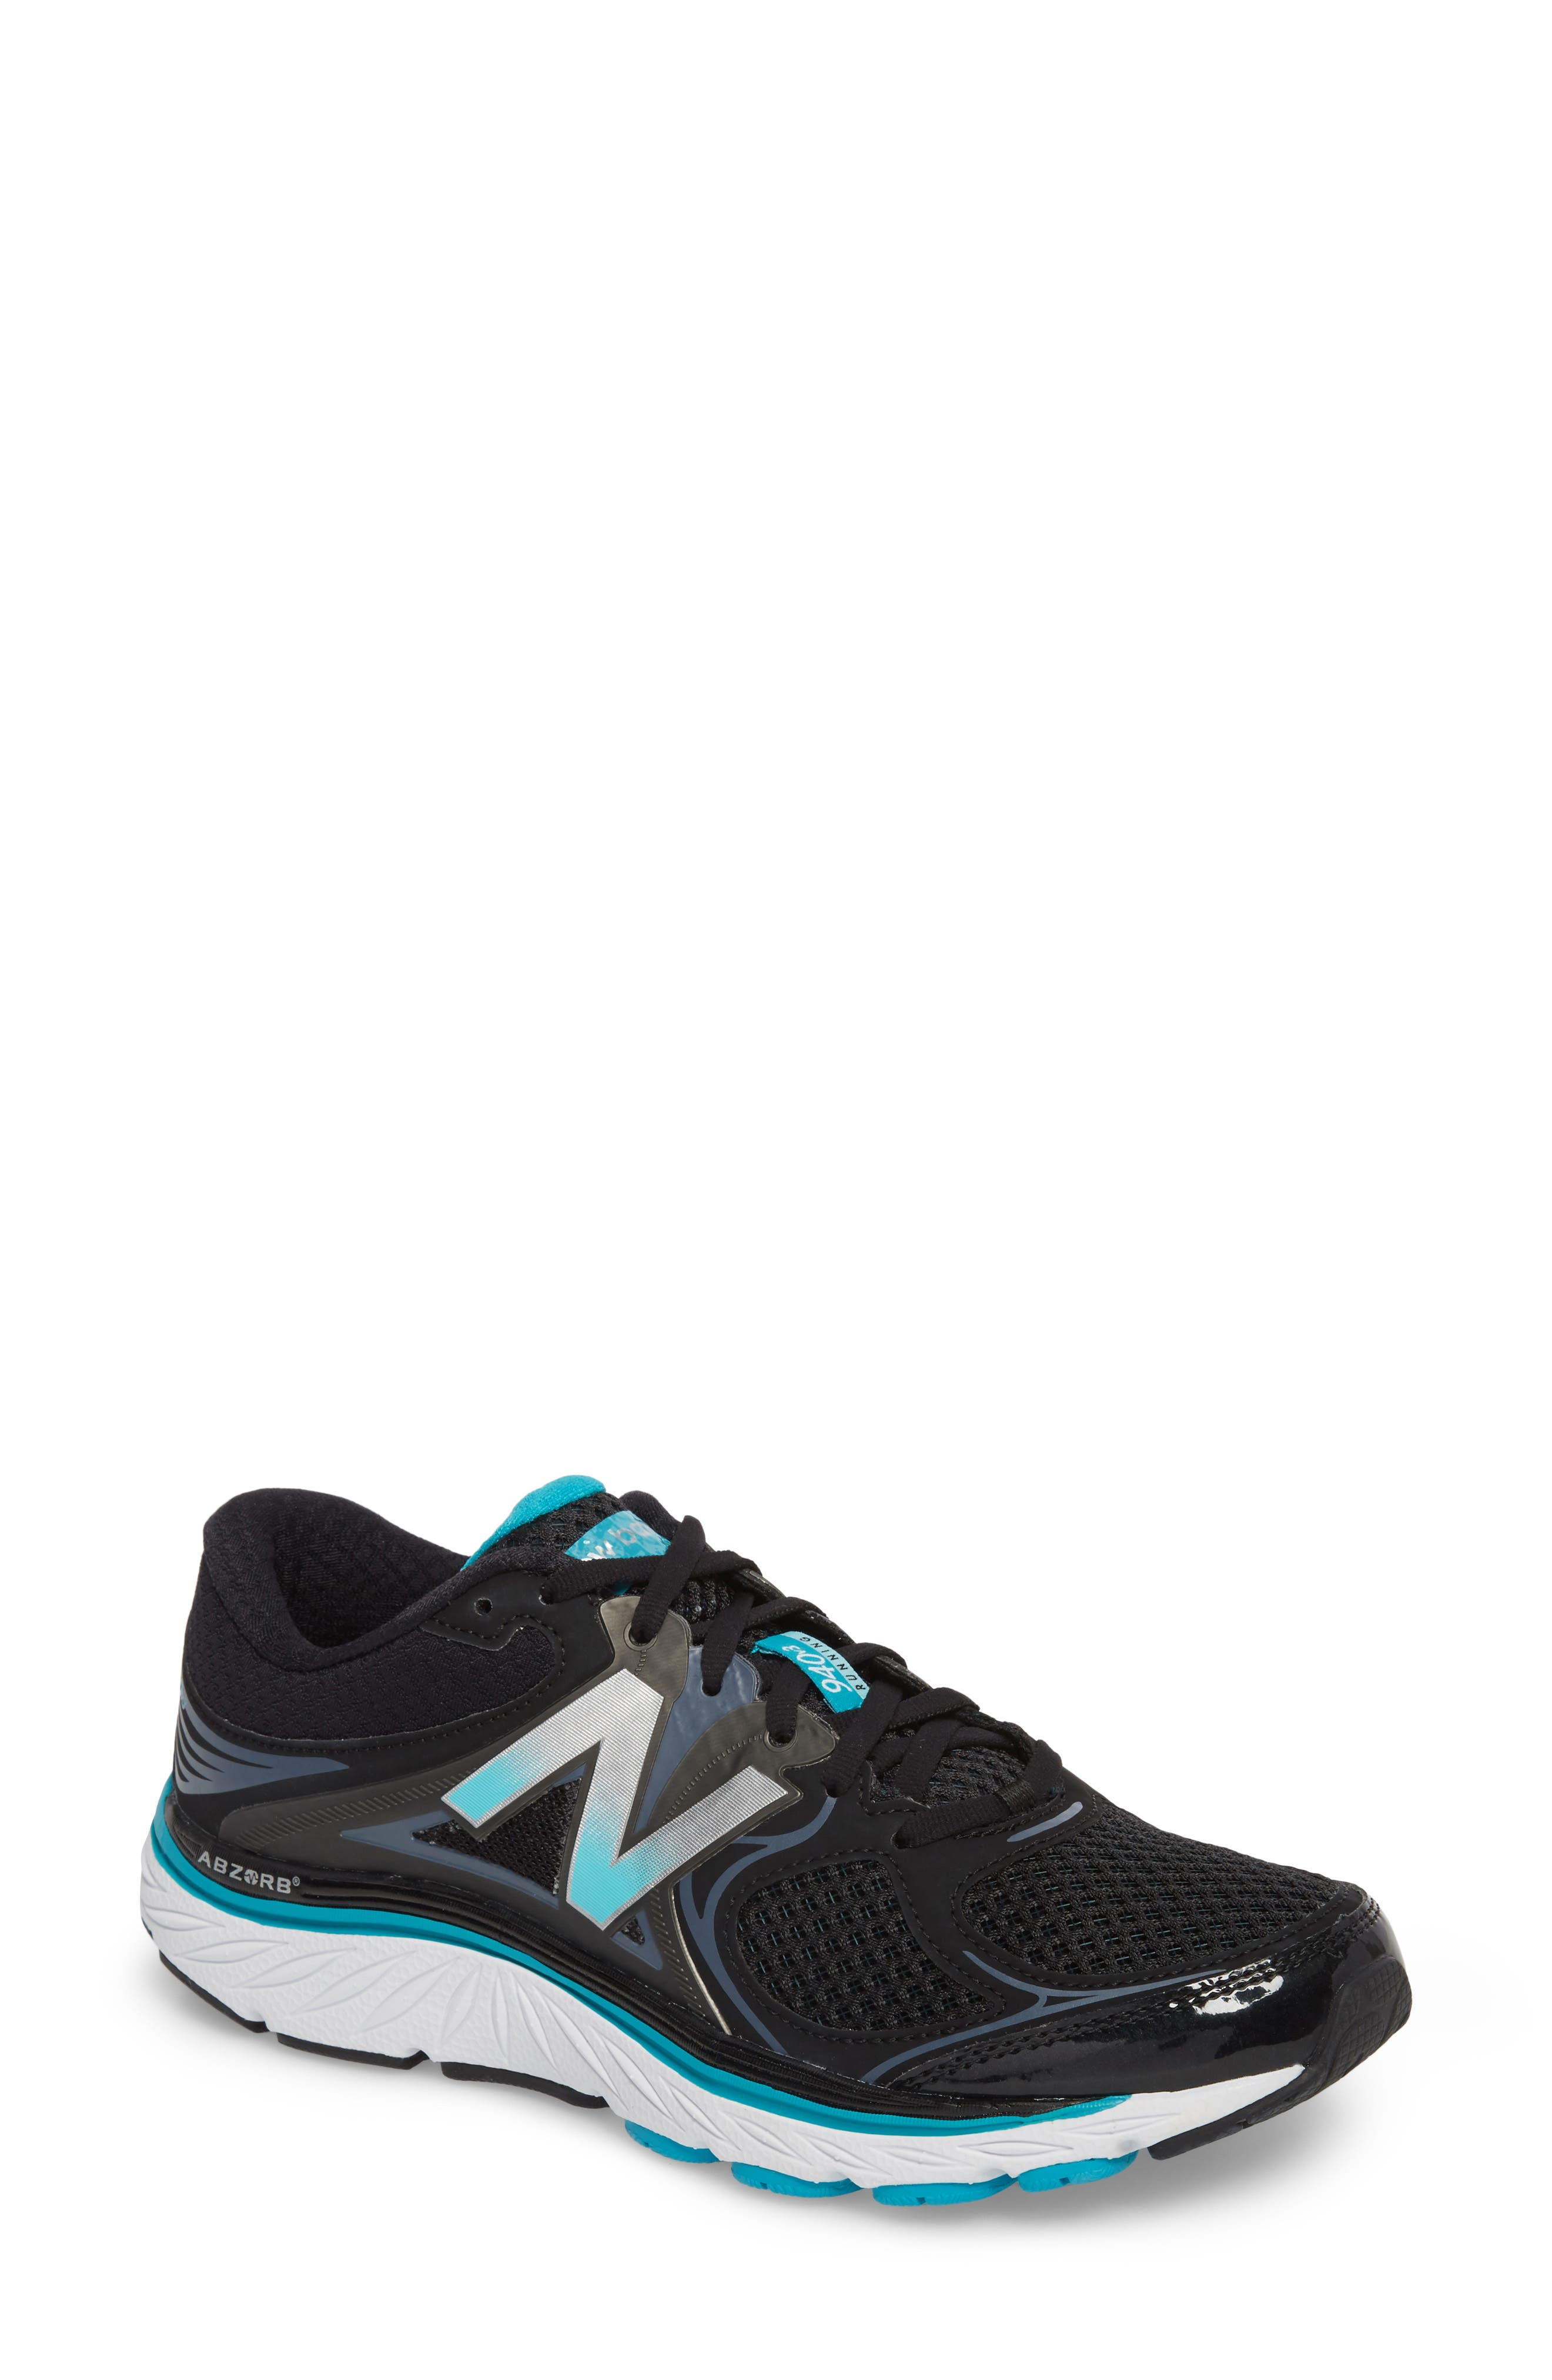 NEW BALANCE, 940v3 Running Shoe, Main thumbnail 1, color, BLACK/ BLUE